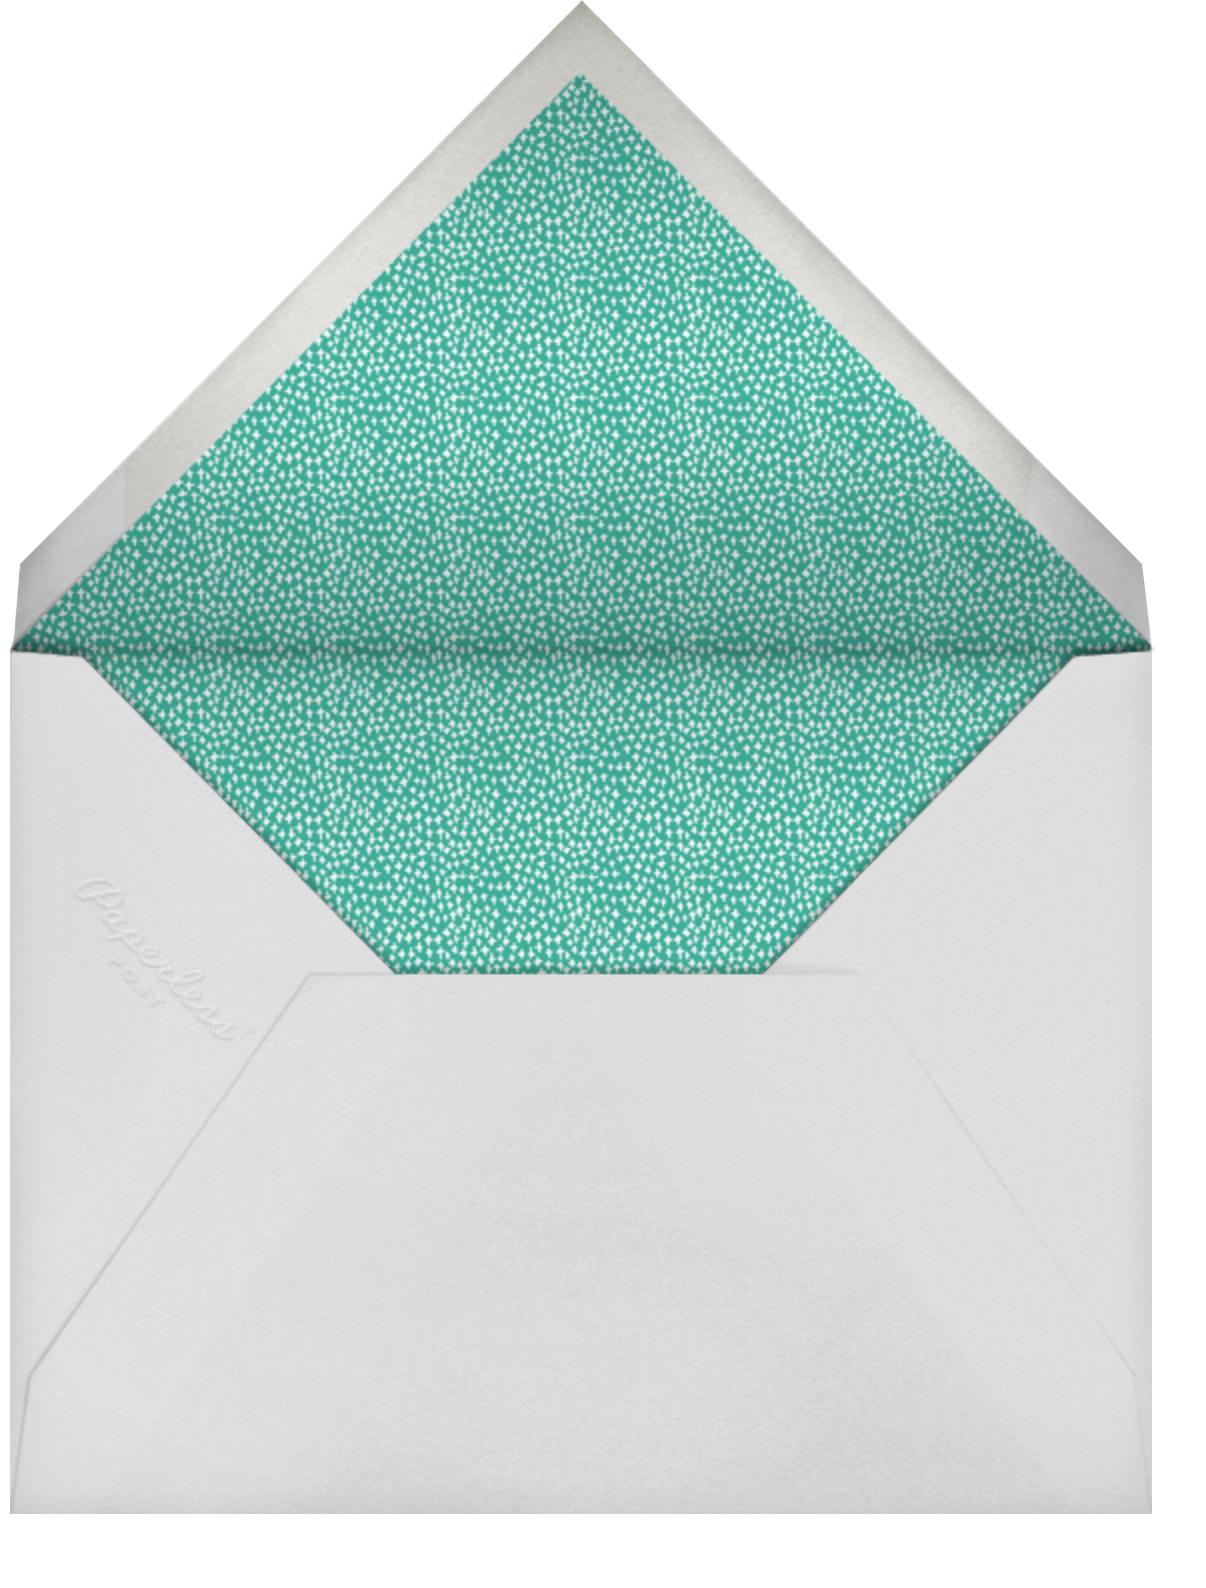 Neck and Neck - Mr. Boddington's Studio - Kids' birthday - envelope back